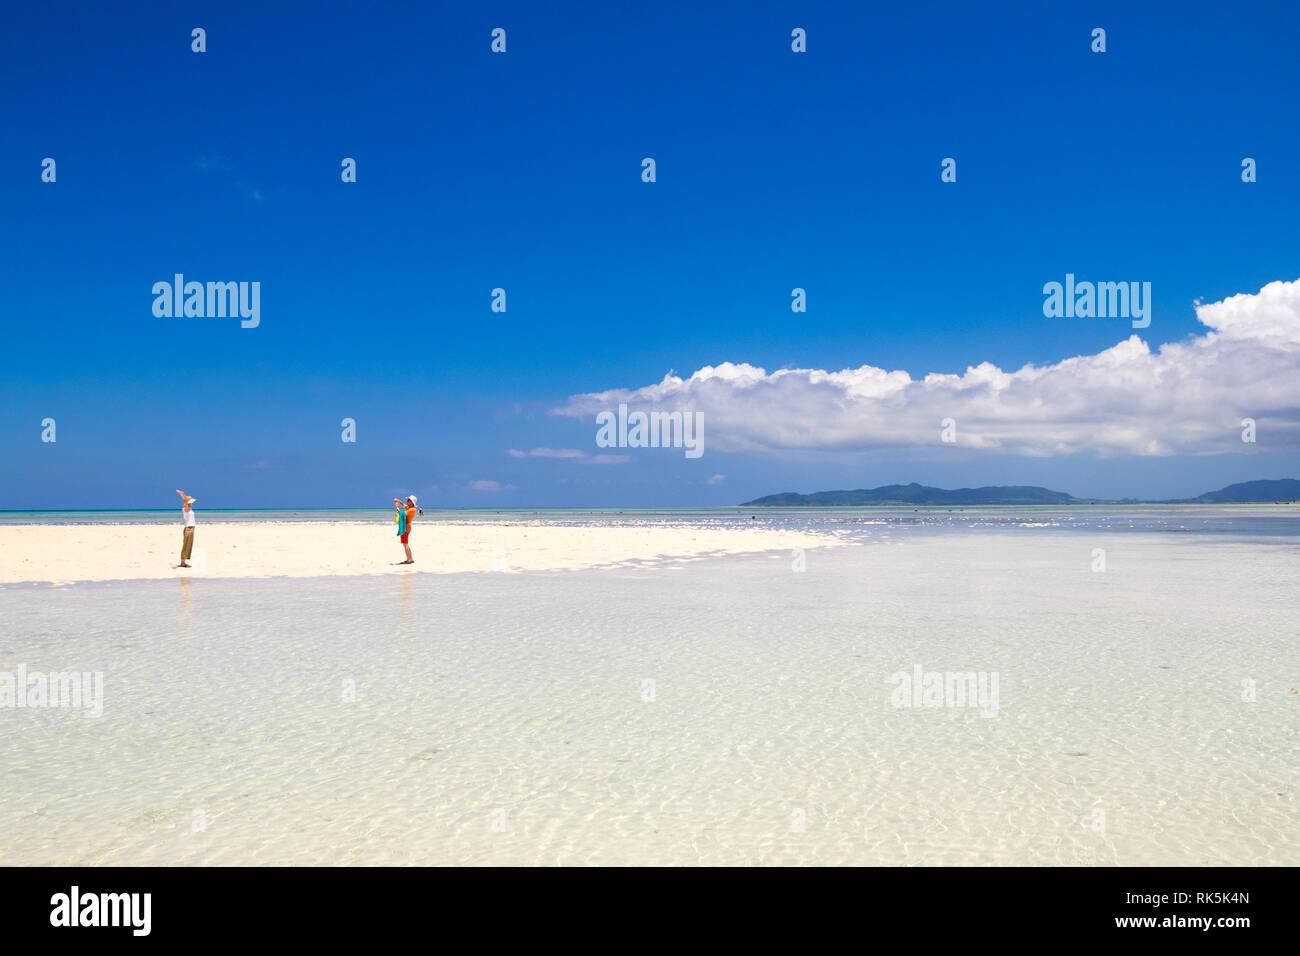 A couple on a spit of white sand by clear turquoise waters. Kondoi Beach, Taketomi Island (Taketomi-jima), Yaeyama Islands, Okinawa Prefecture, Japan. - Stock Image